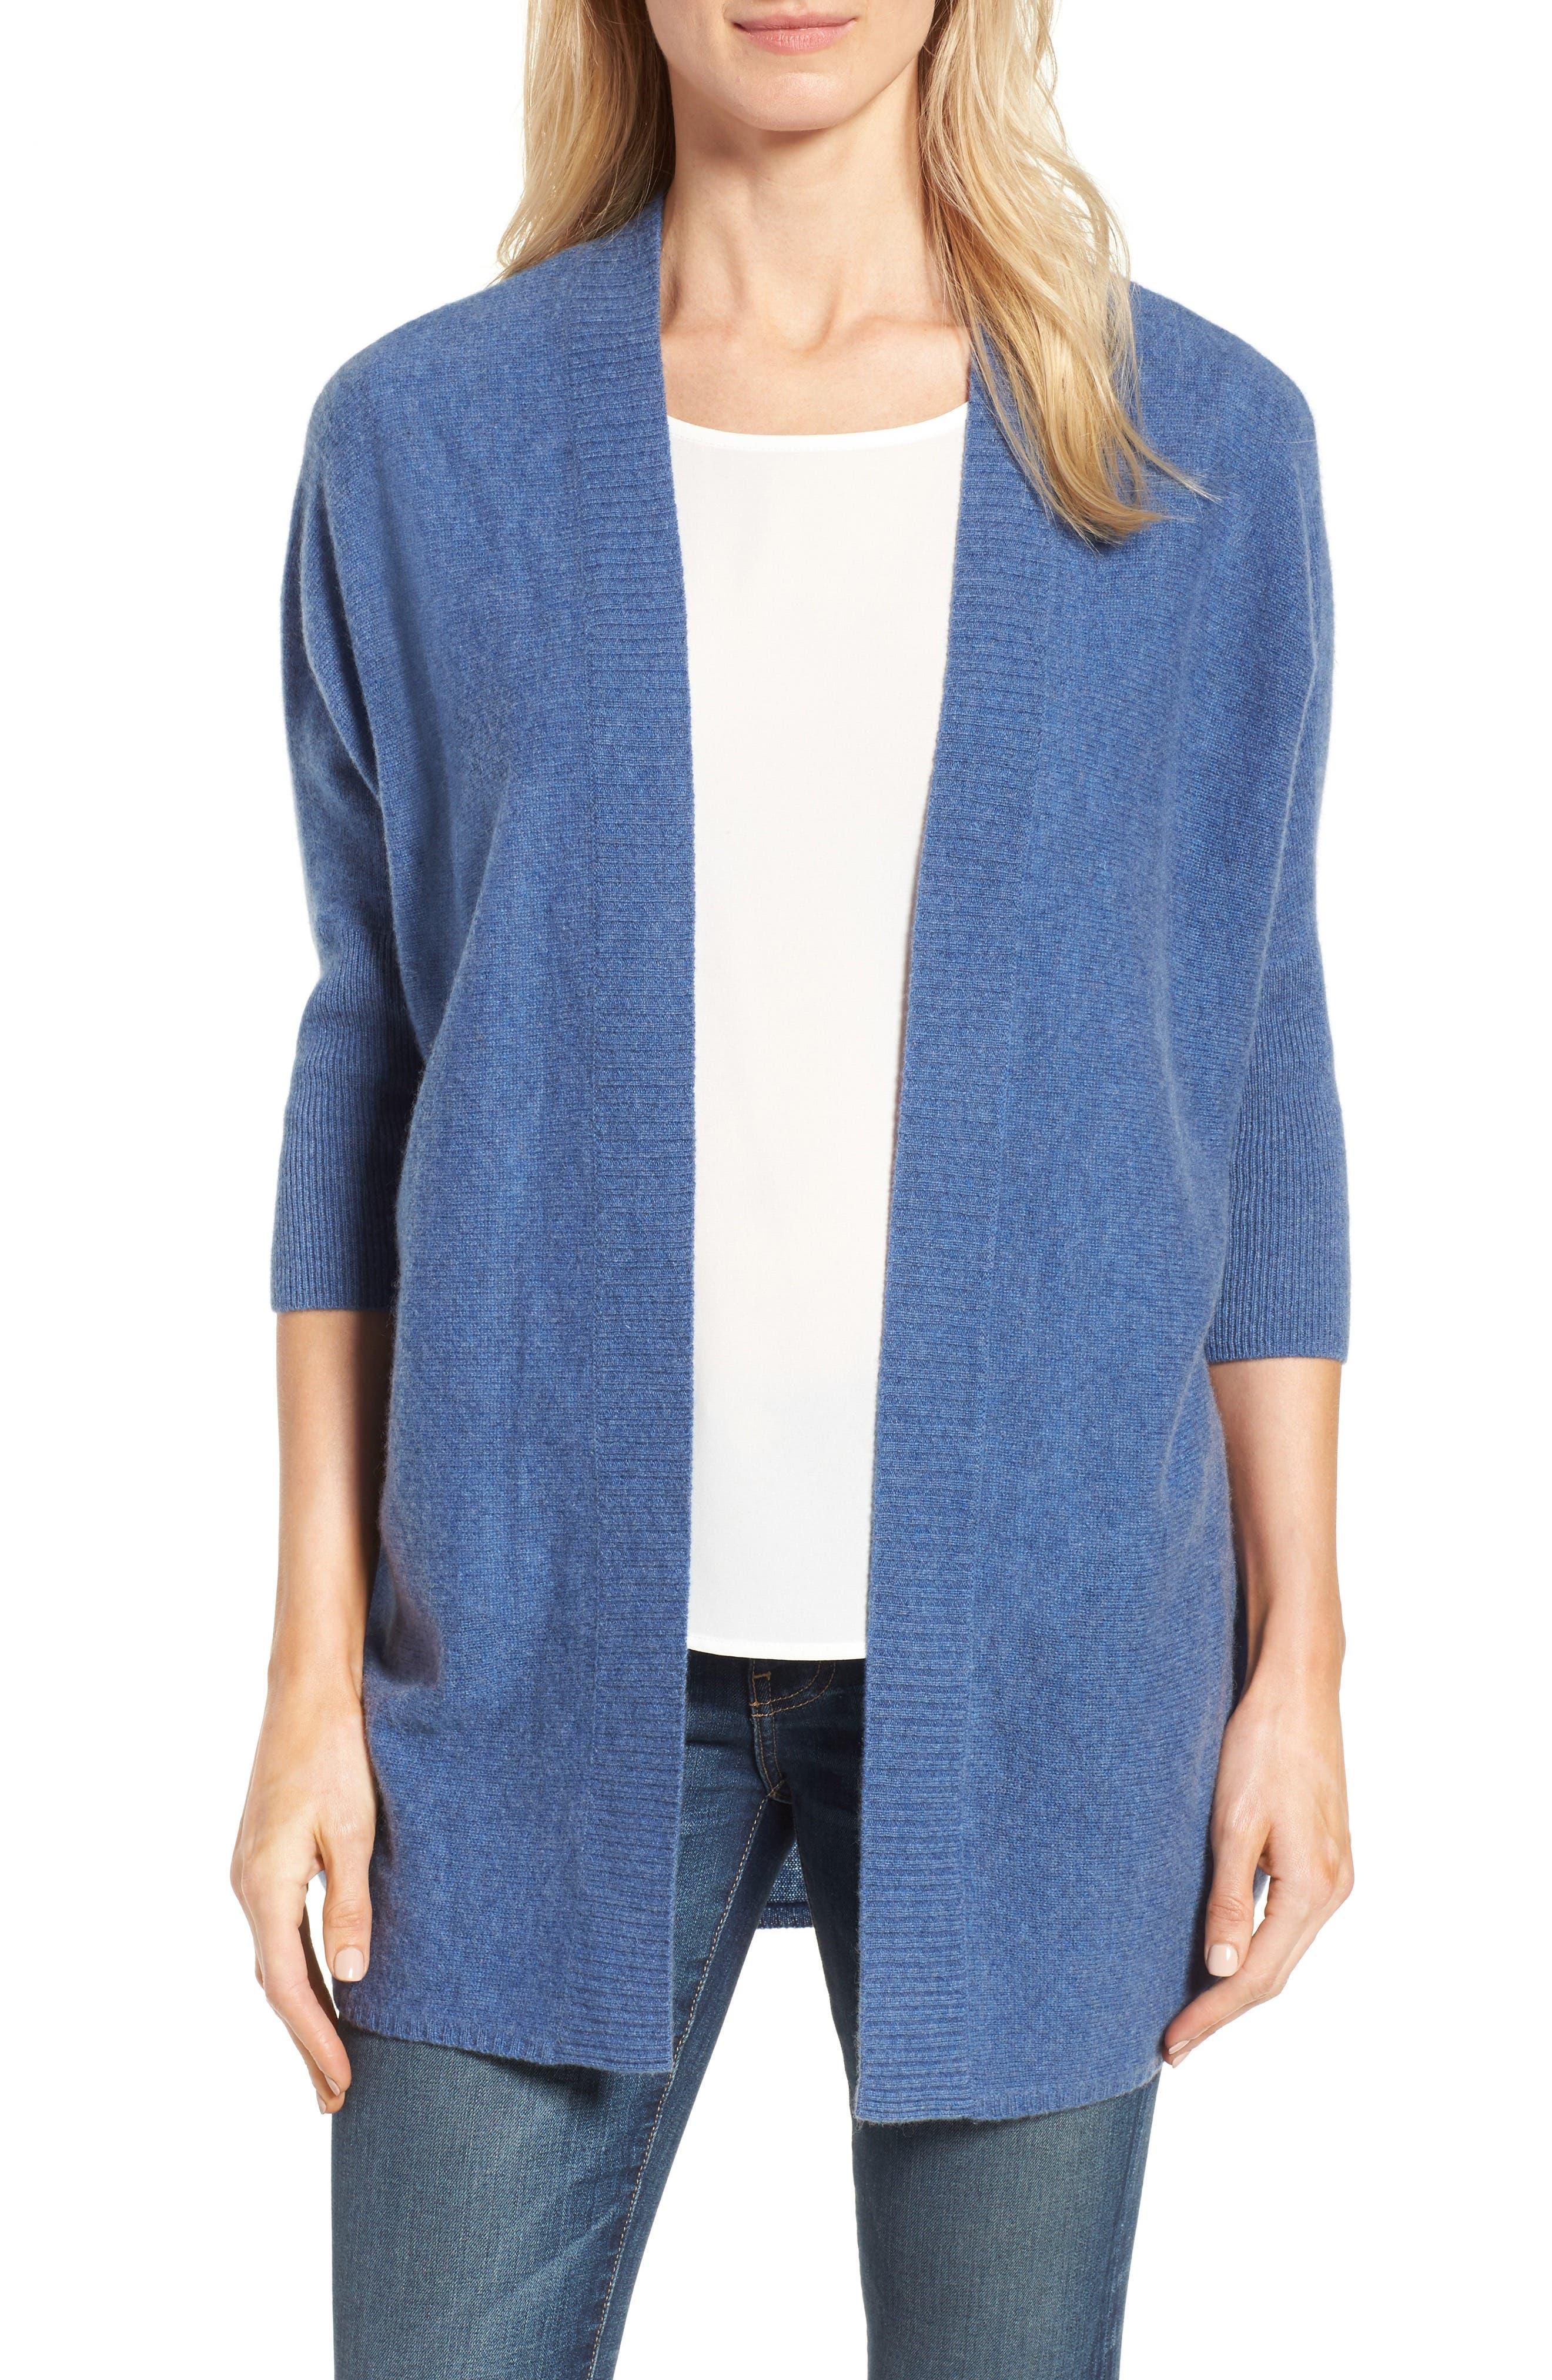 Alternate Image 1 Selected - Halogen® Three-Quarter Sleeve Cashmere Cardigan